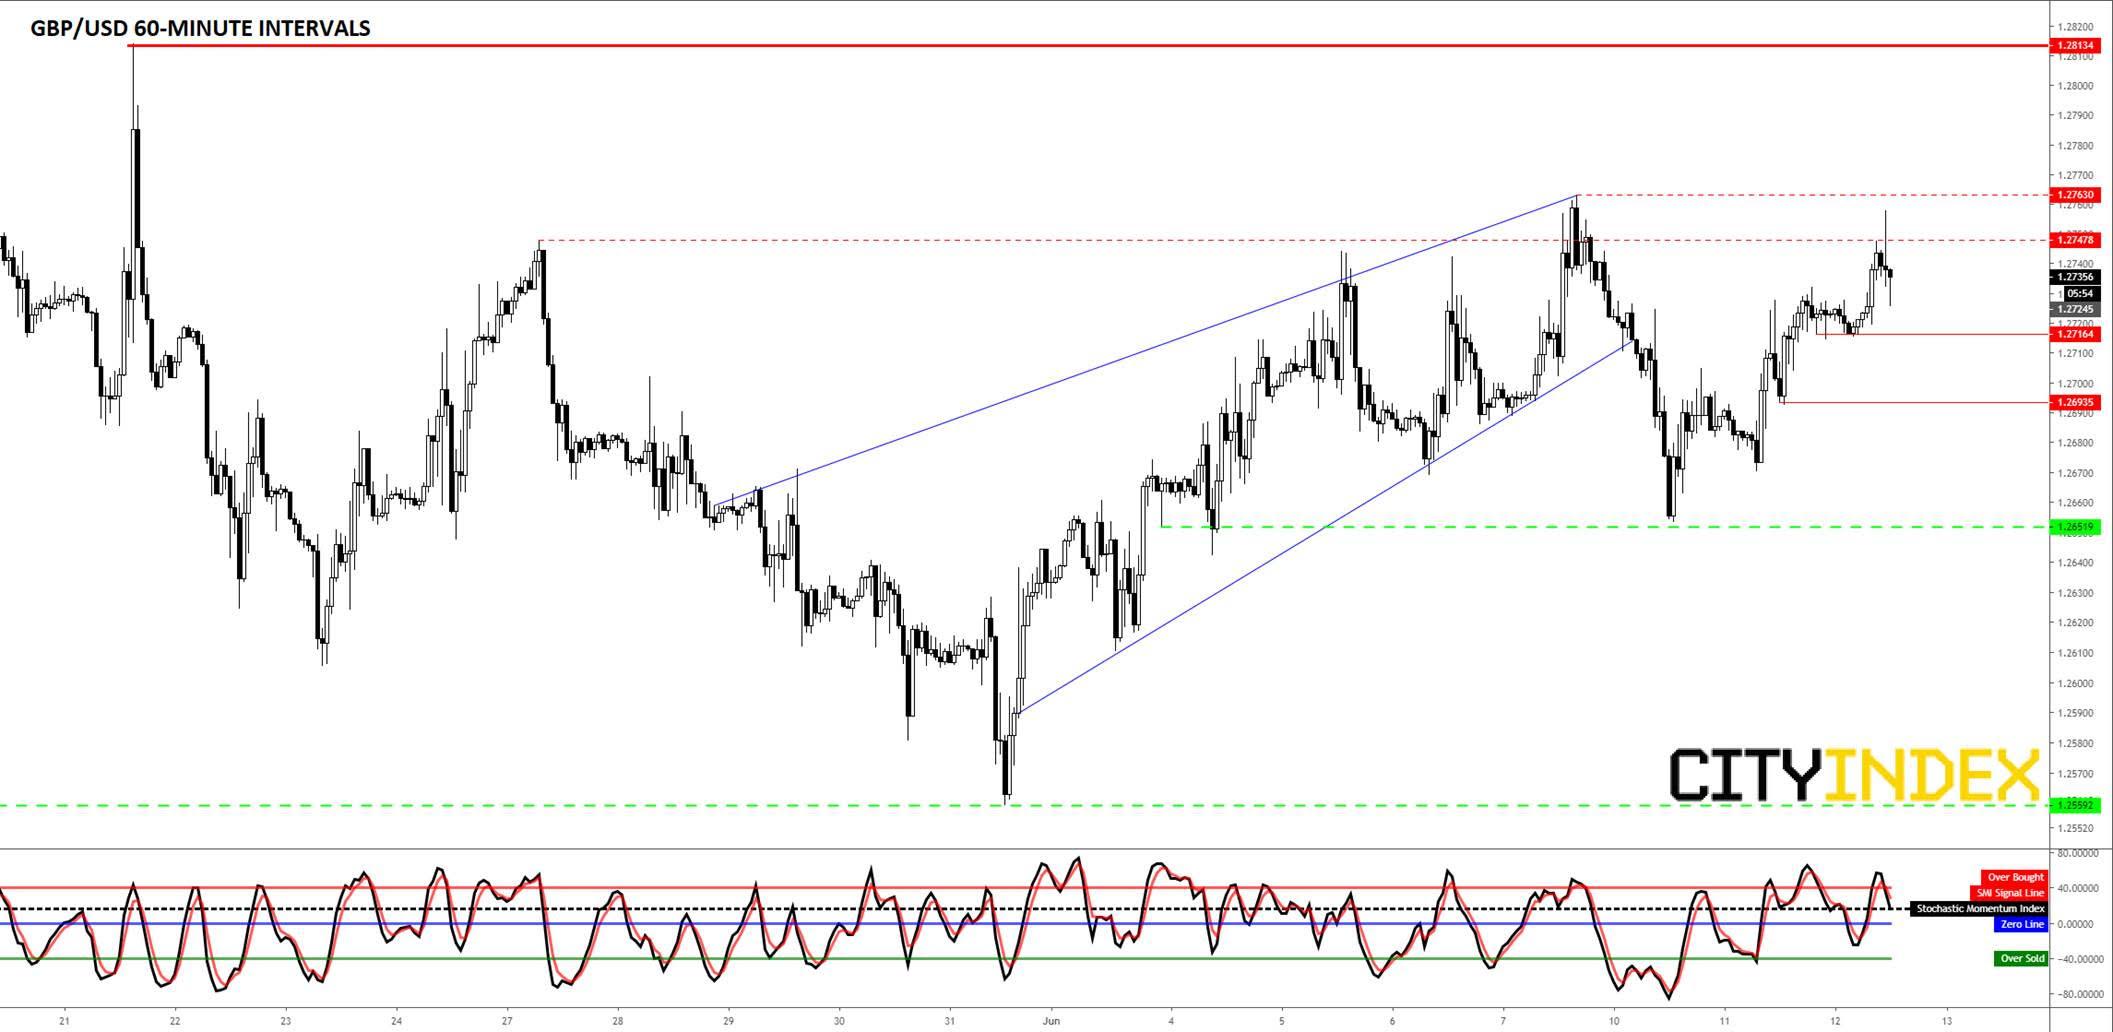 GBP/USD Hourly